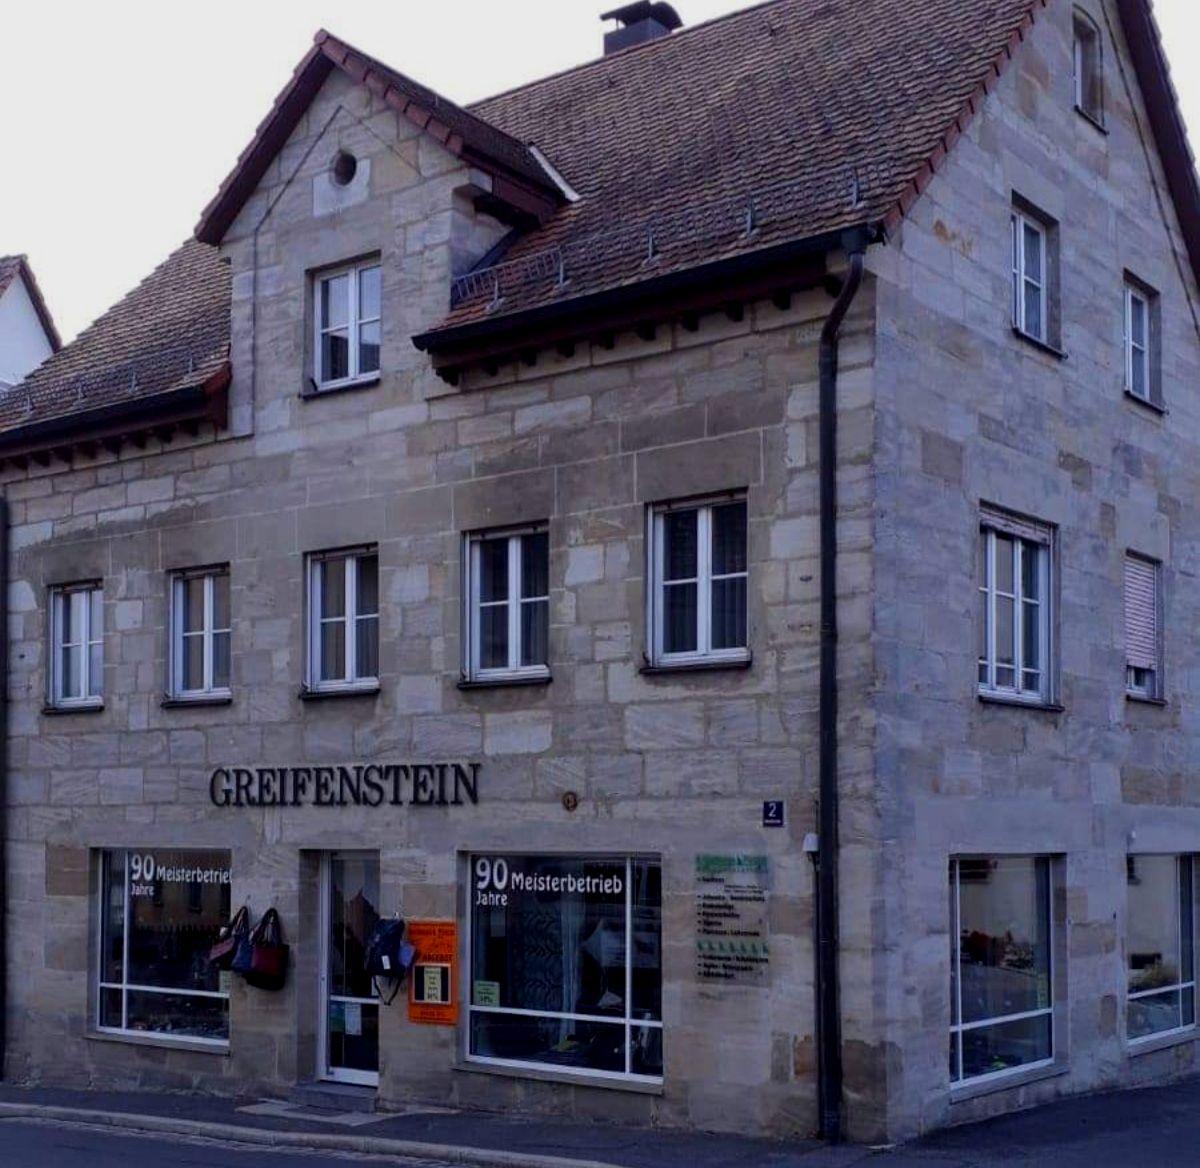 Greifenstein/Pfisterer